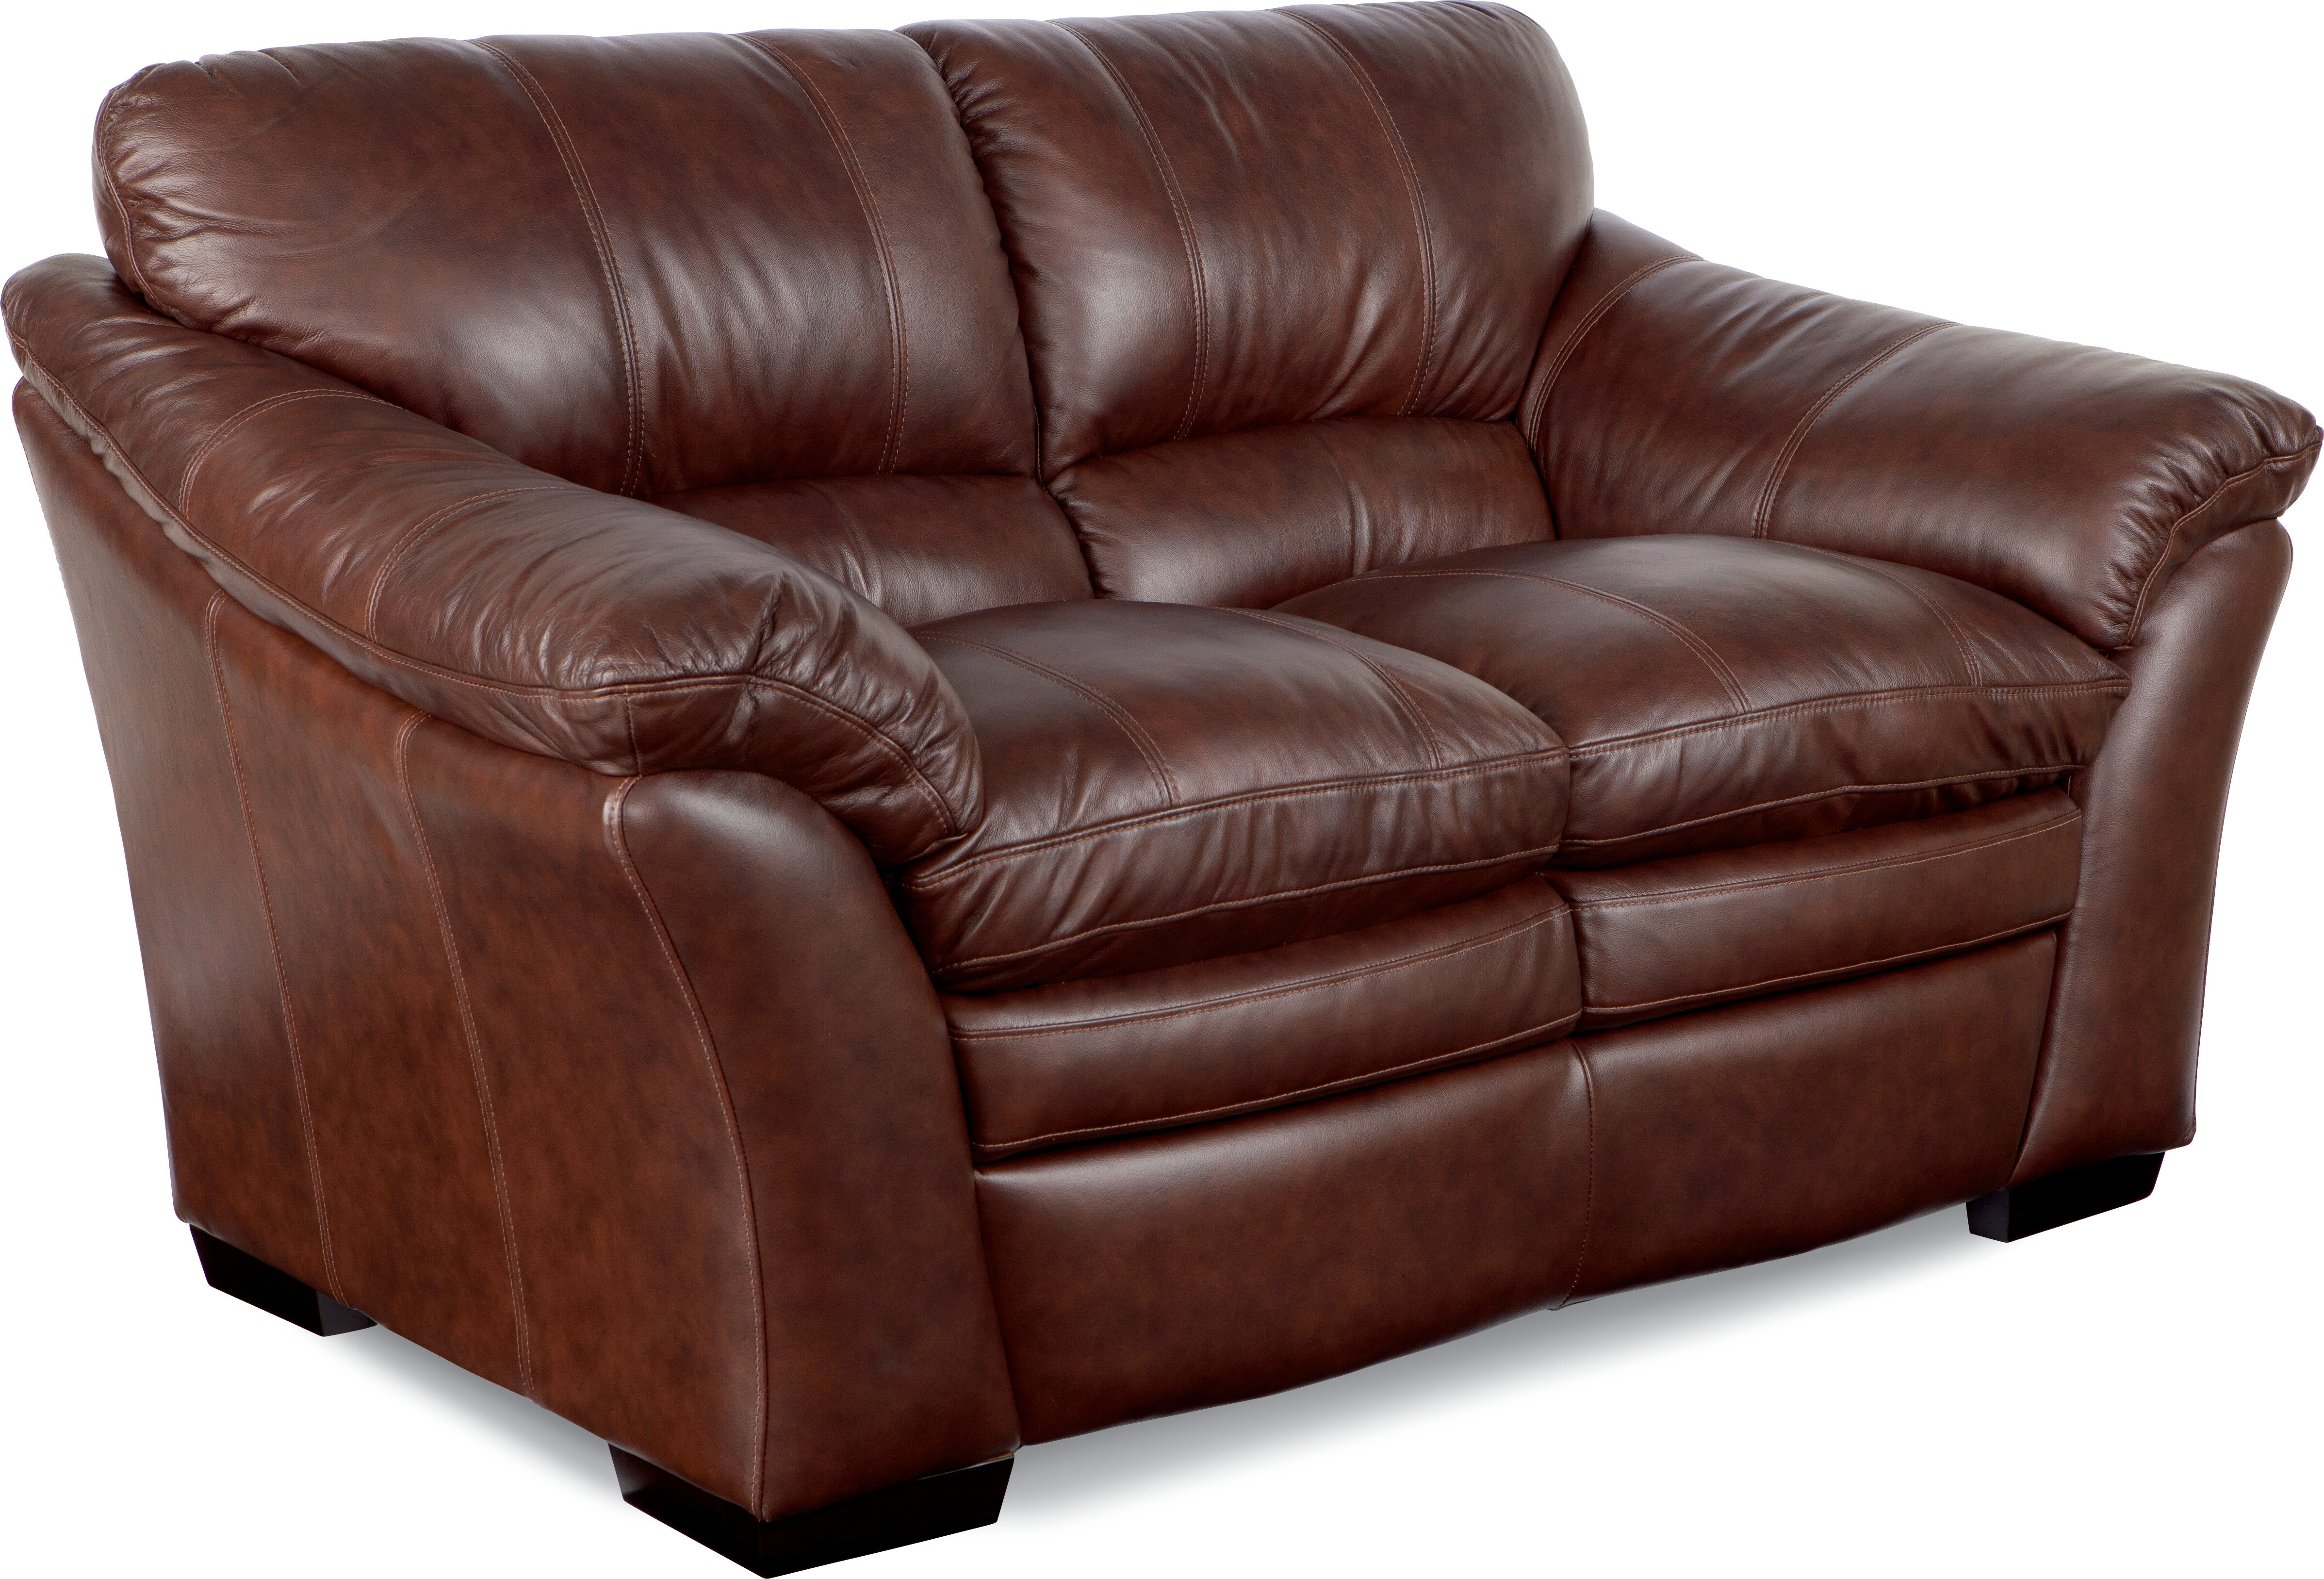 style ekornes leather loveseat percival chairish tan vintage product